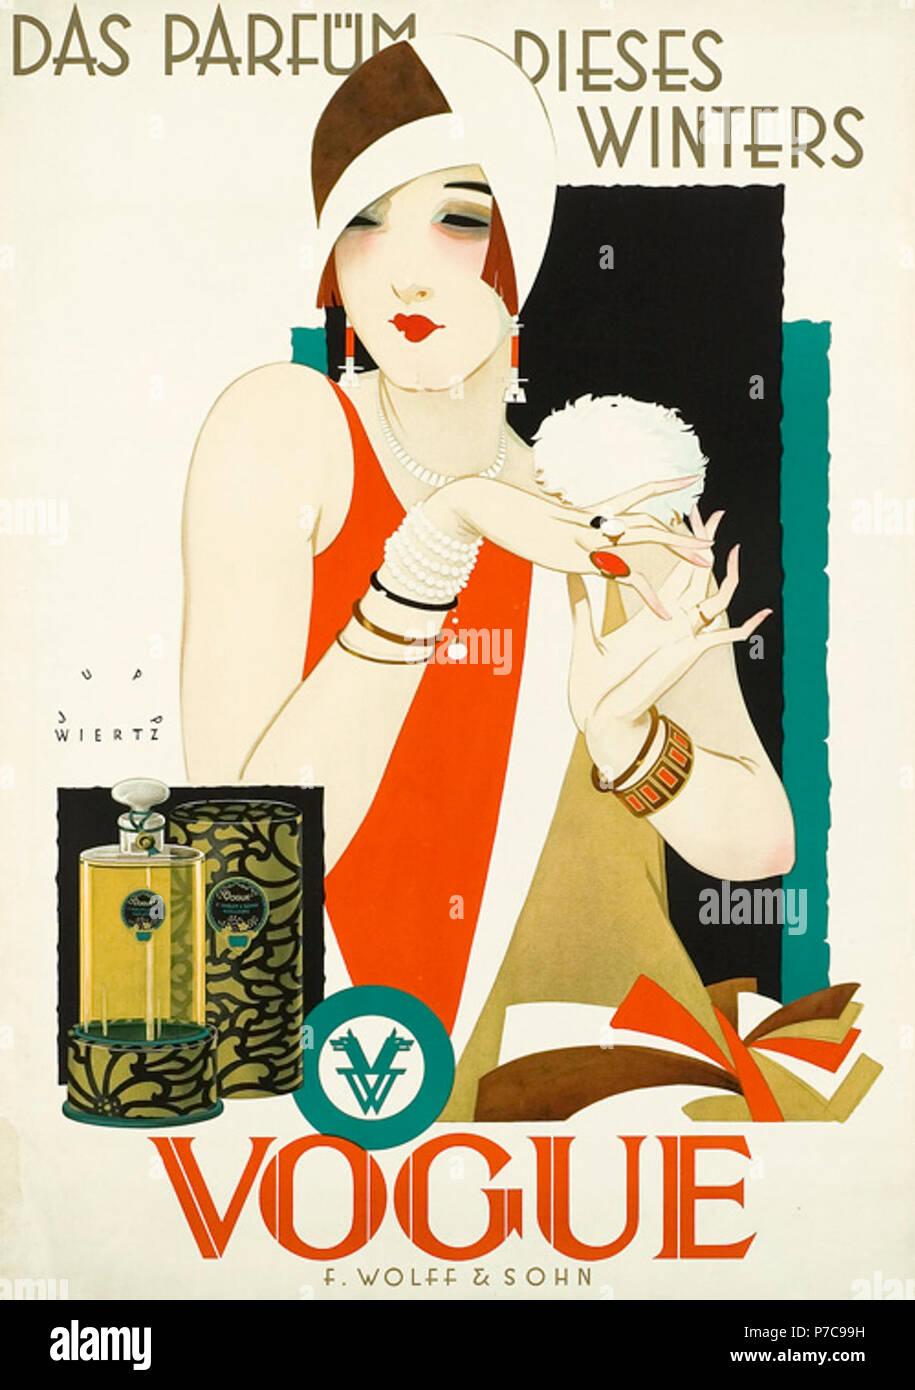 1926 1927 circa Jupp Wiertz Plakat Das Parfüm dieses Winters - Vogue, Firma F. Wolff & Sohn, Karlsruhe. Stock Photo